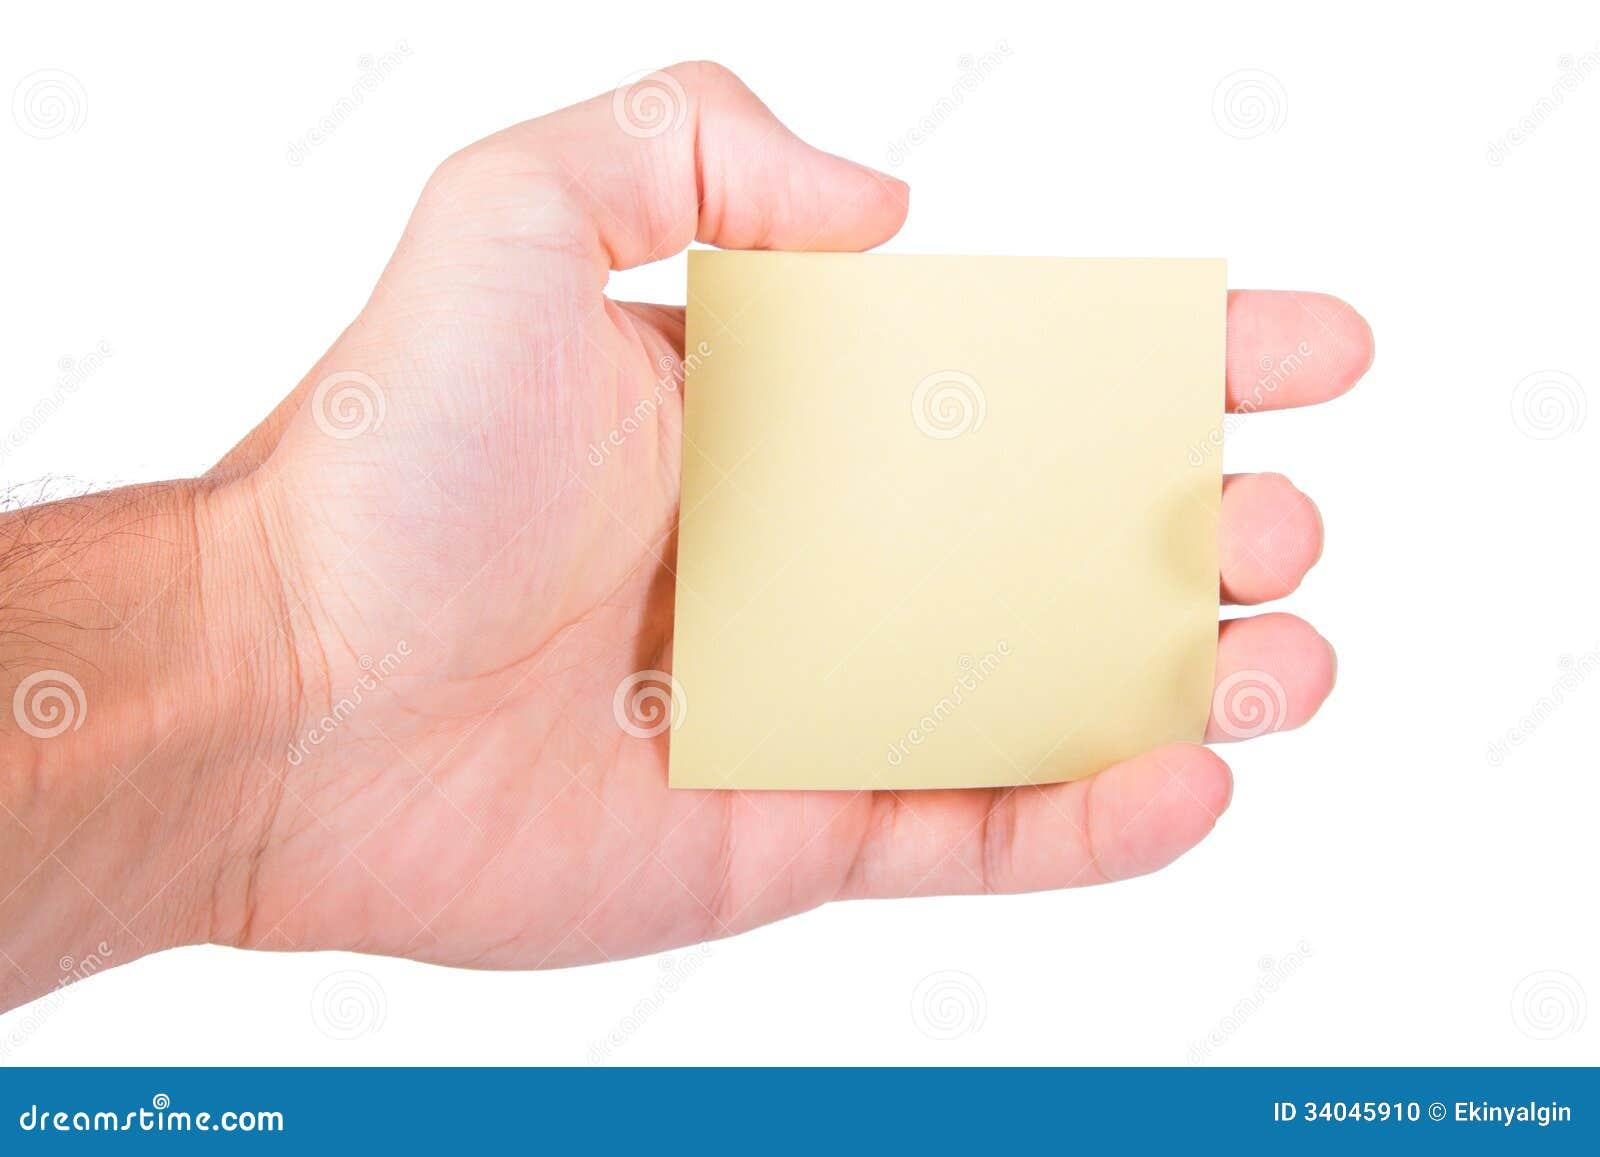 Note hand